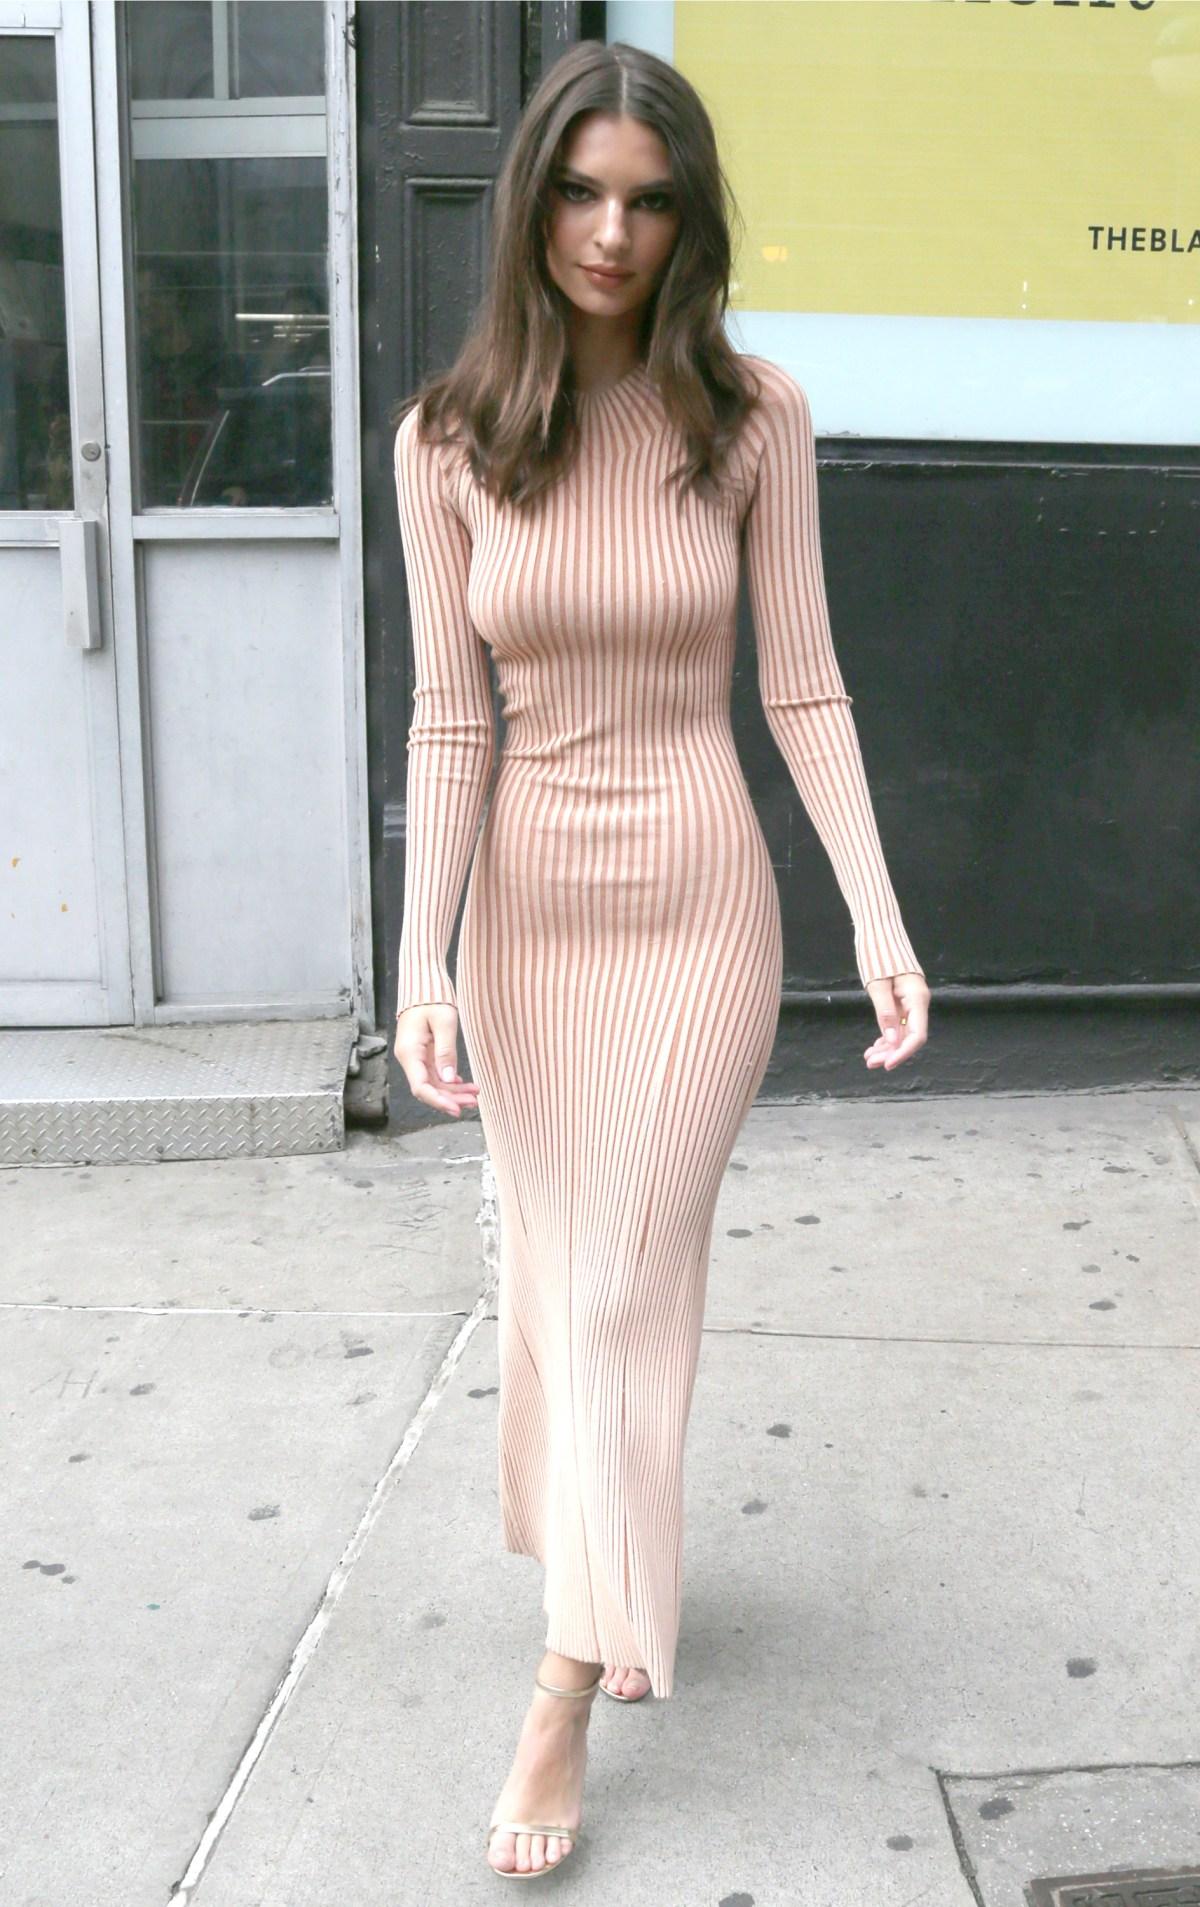 Emily Ratajkowskis Style: Model Wears Nude, Slinky Dress